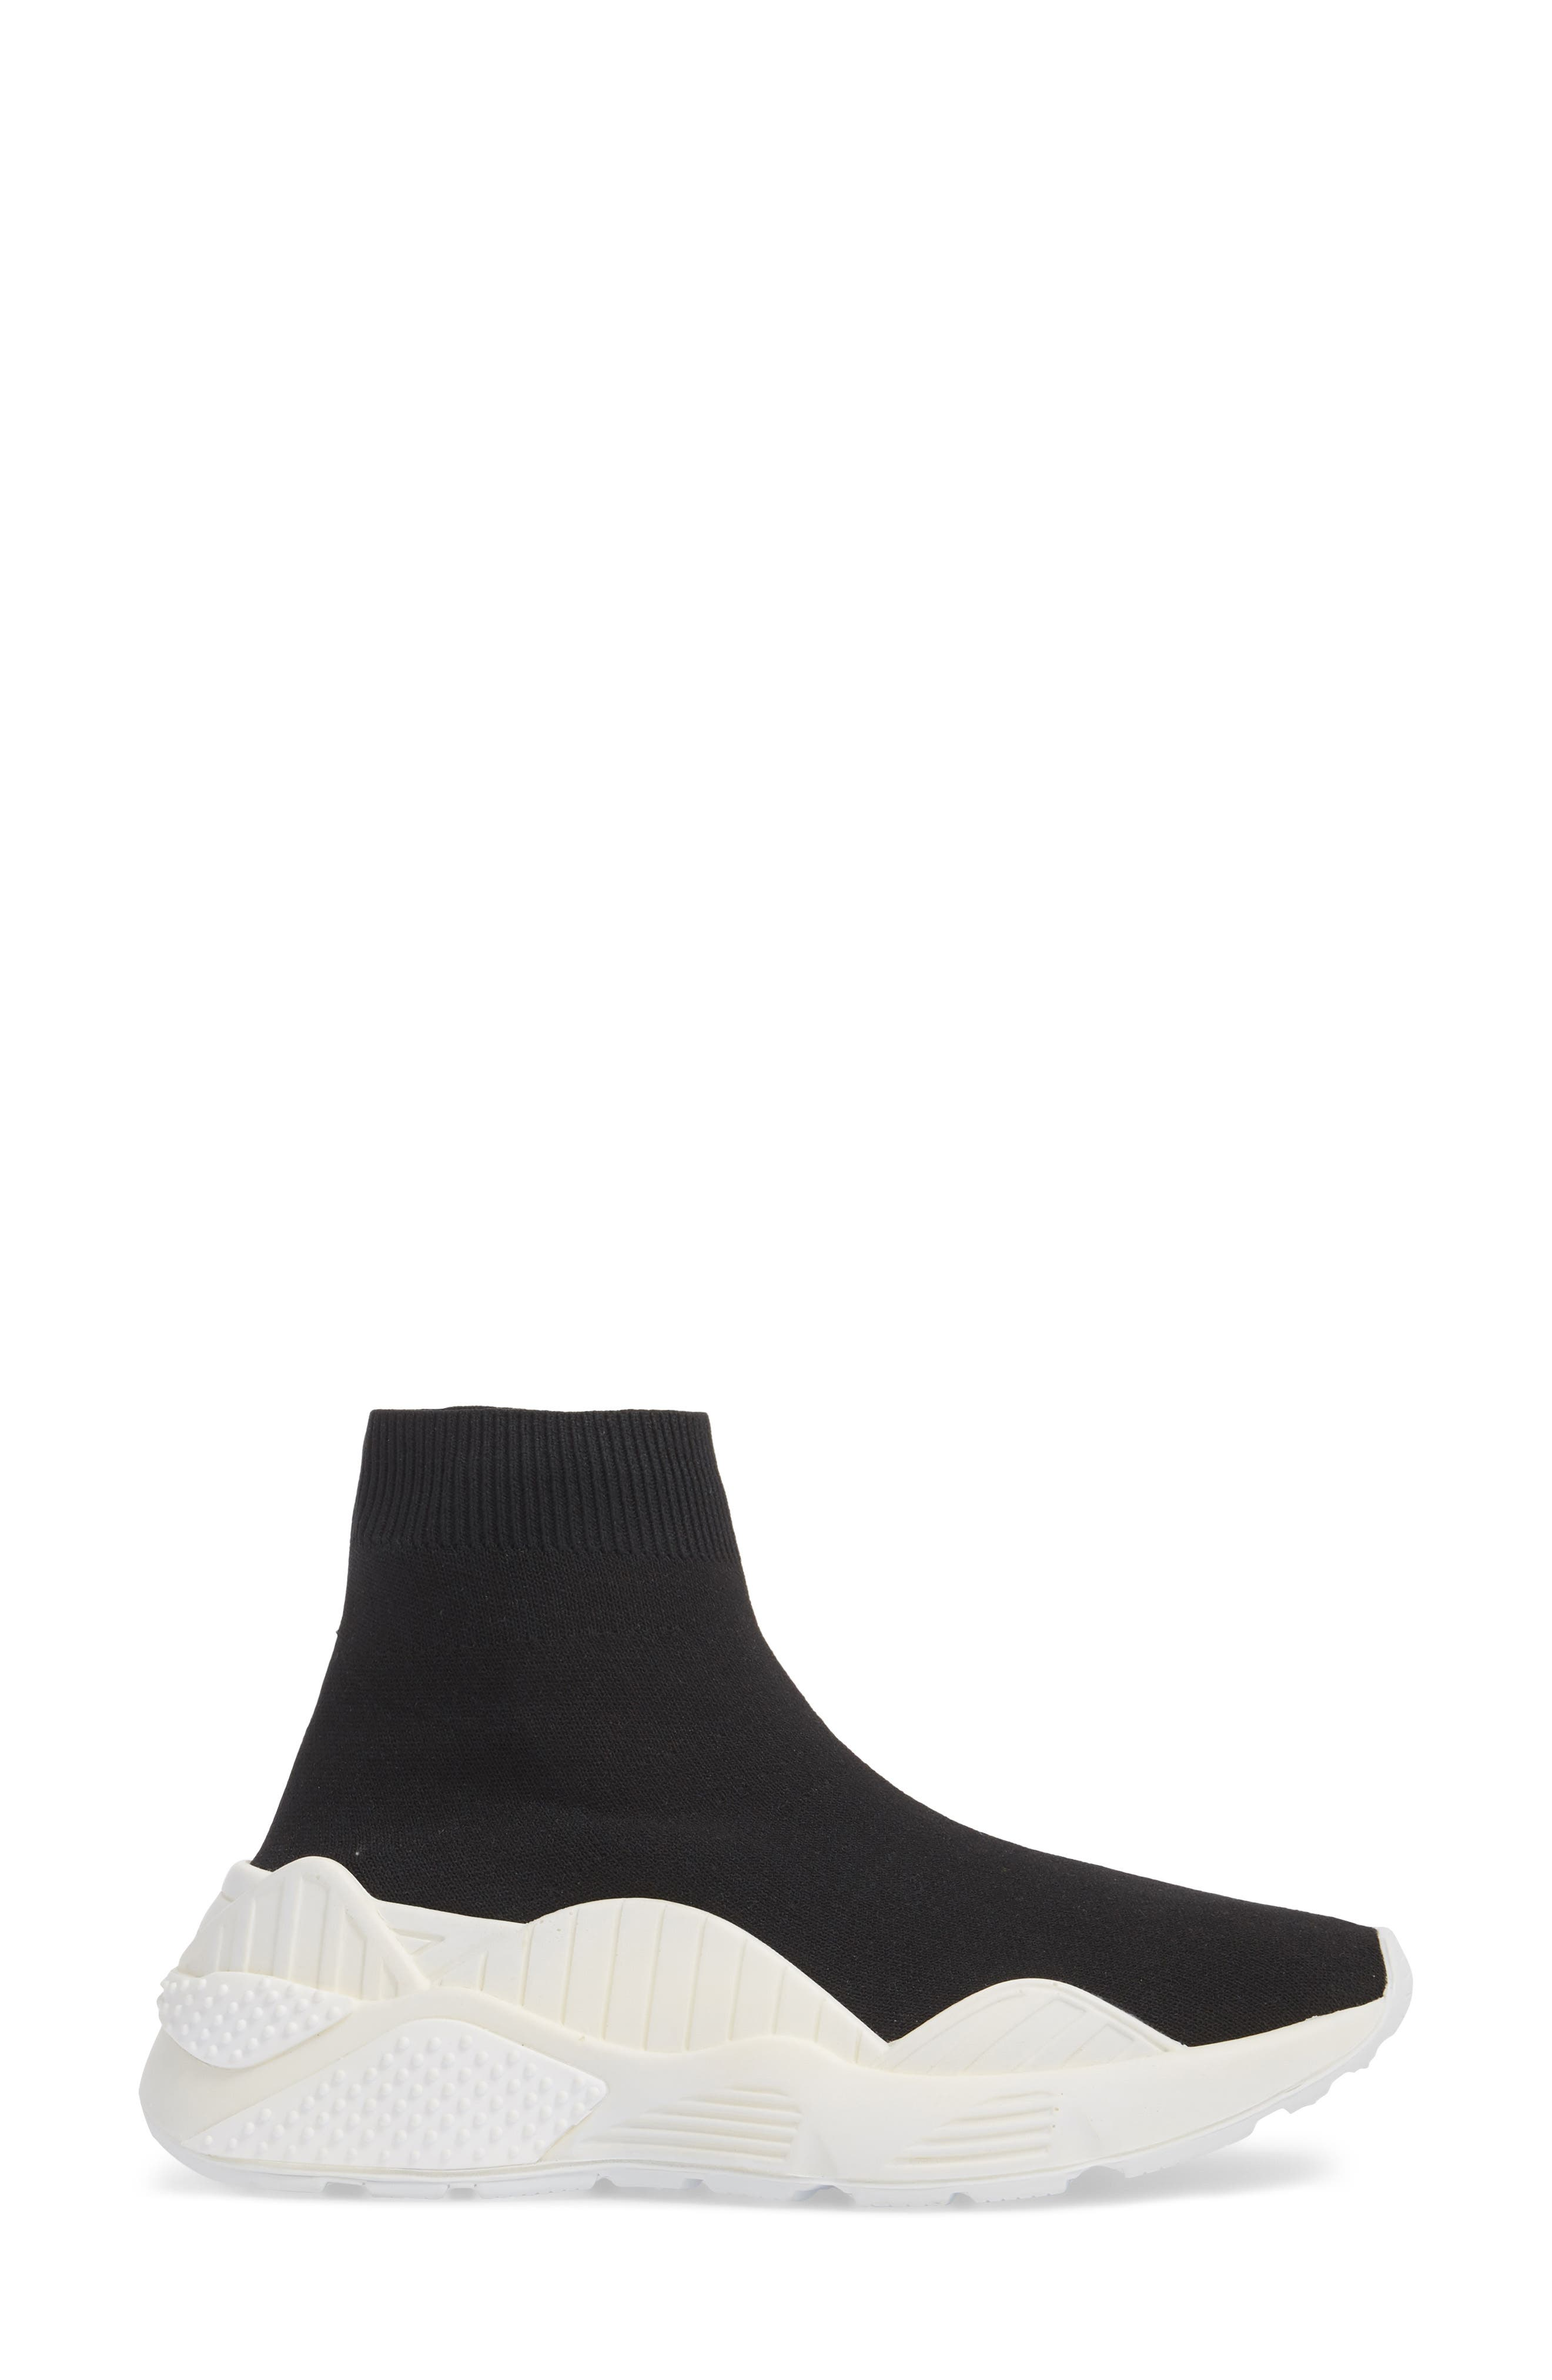 Lunix Sock Sneaker,                             Alternate thumbnail 3, color,                             Black/ White Leather